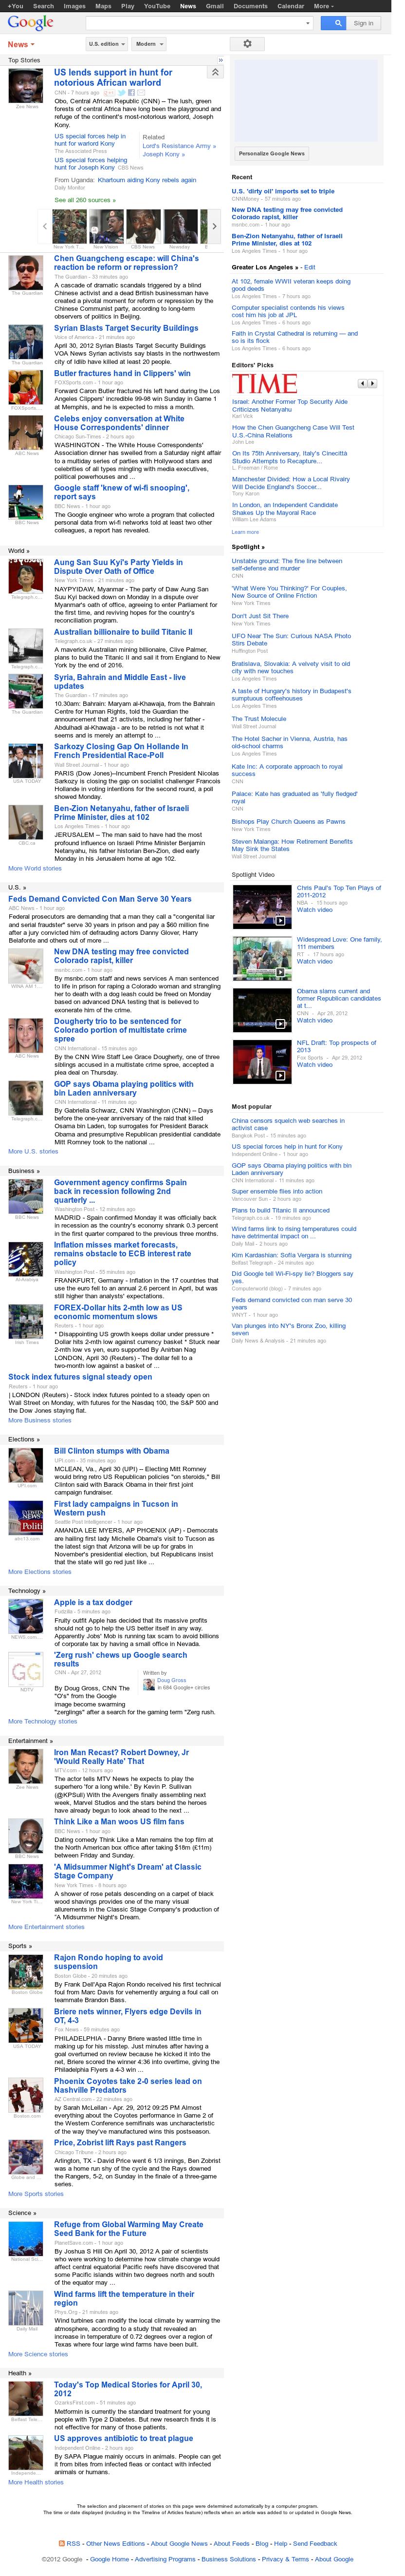 Google News at Monday April 30, 2012, 10:07 a.m. UTC